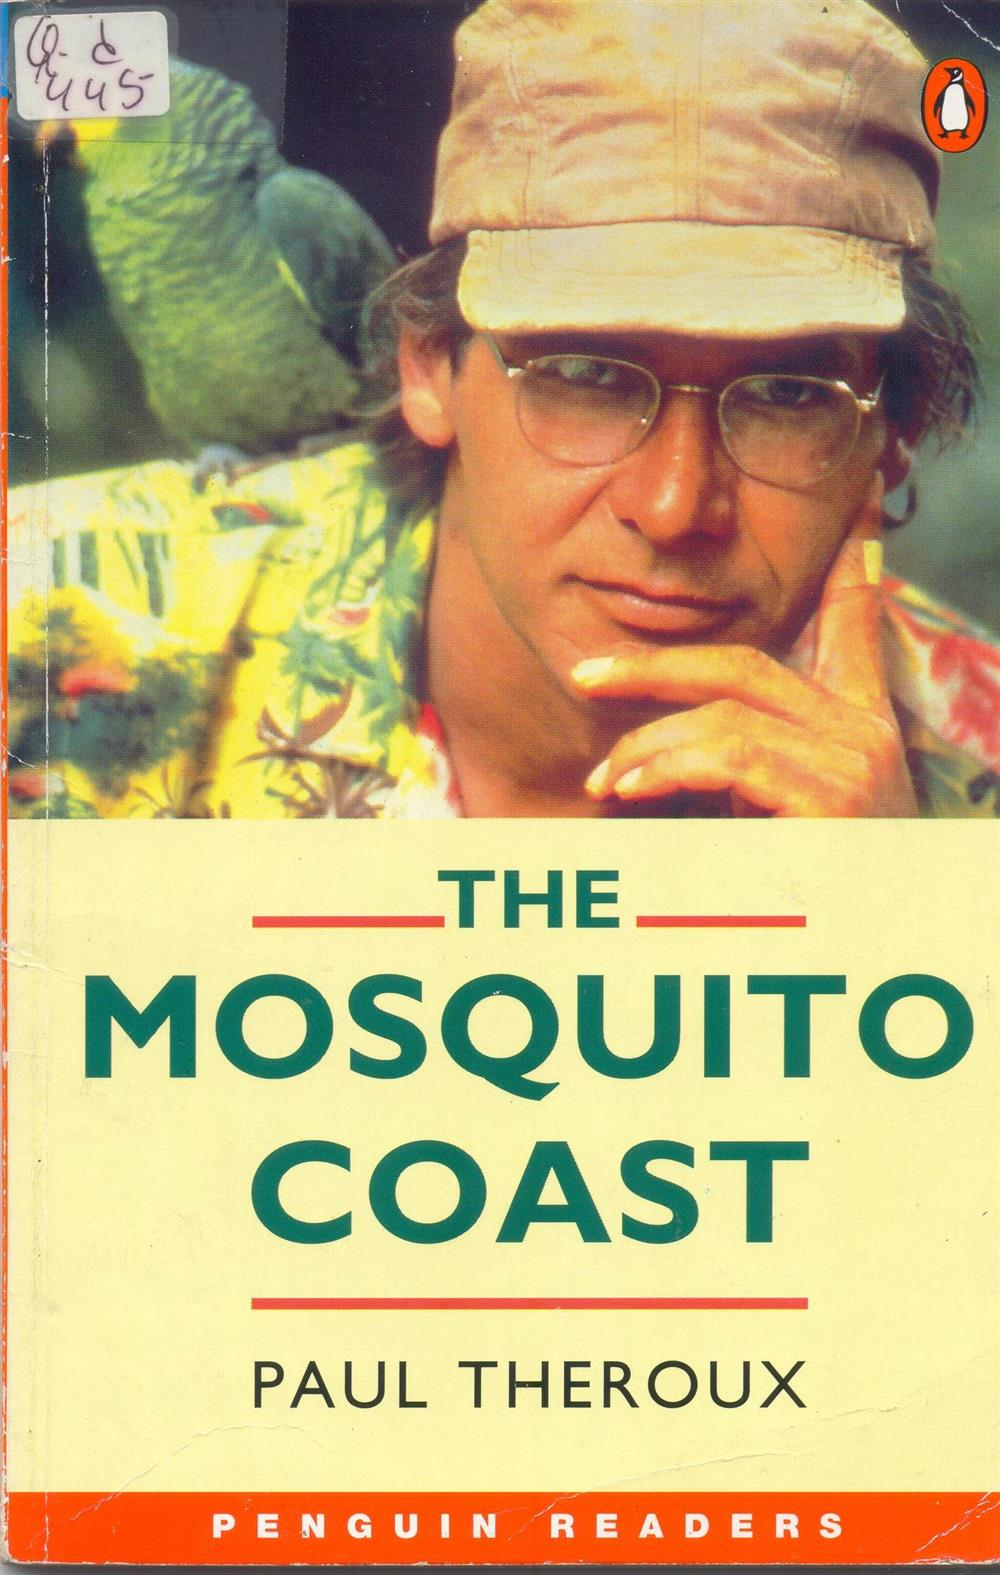 The mosquito coast 001.jpg